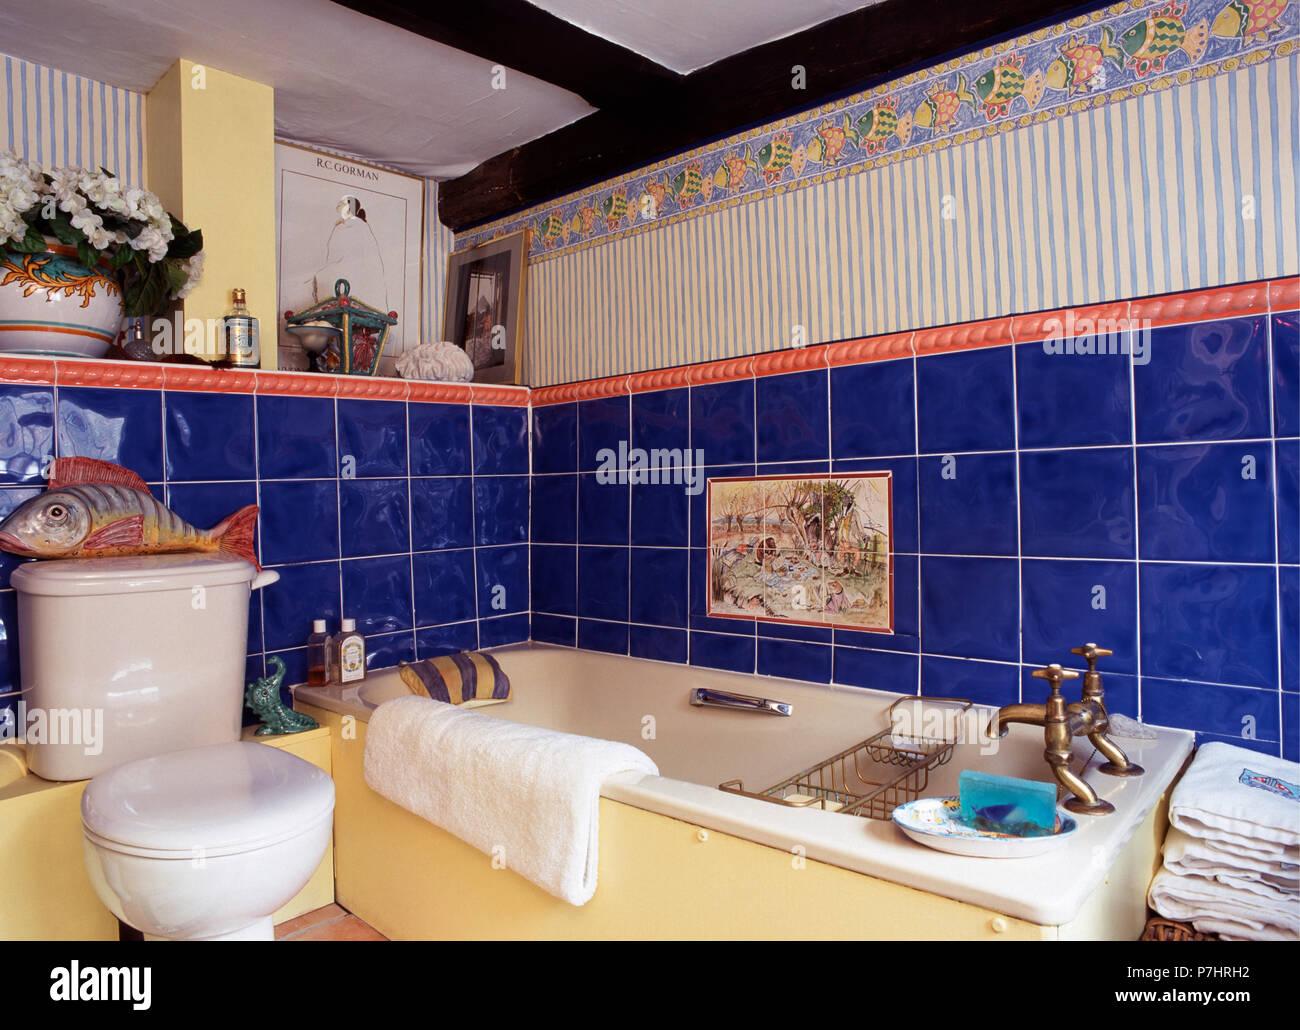 Bath Eighties Photos & Bath Eighties Images - Page 2 - Alamy